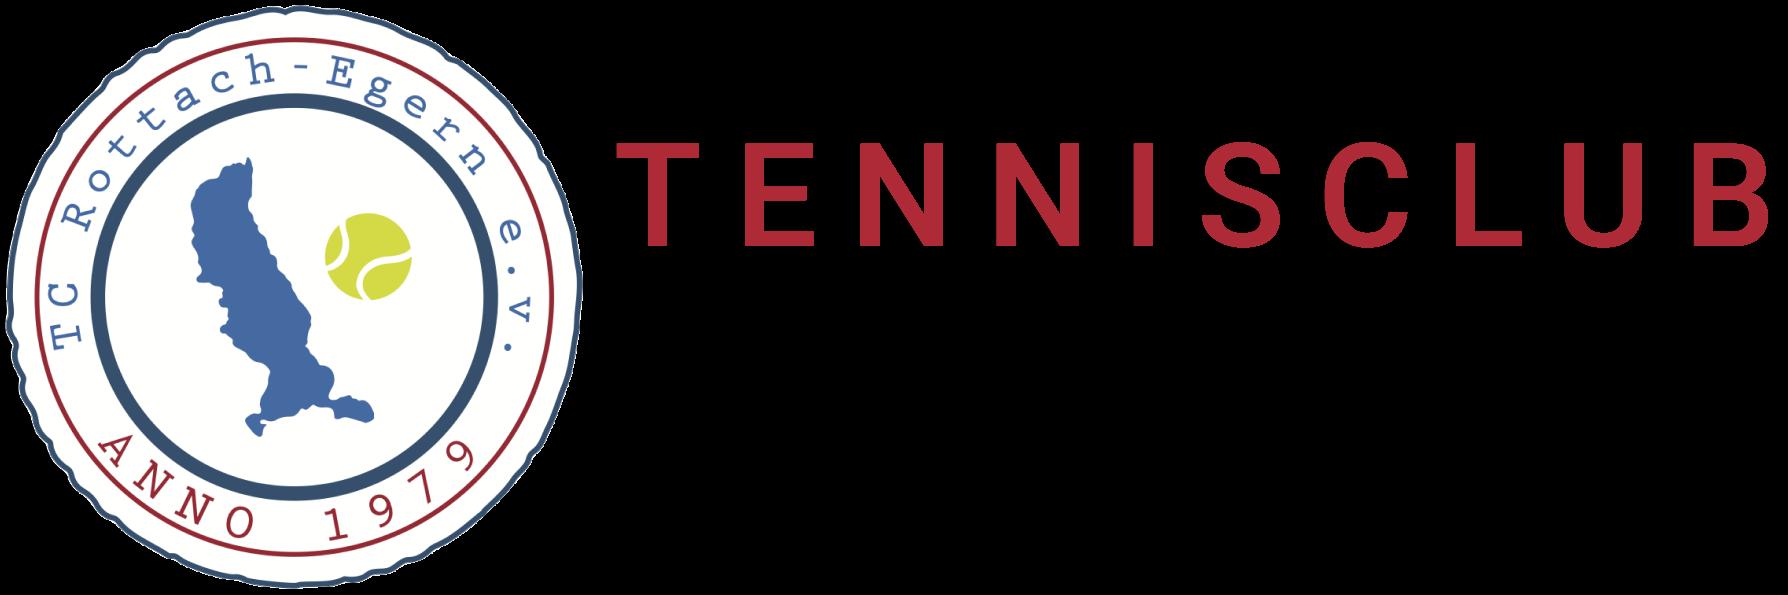 Tennisclub Rottach-Egern e.V.